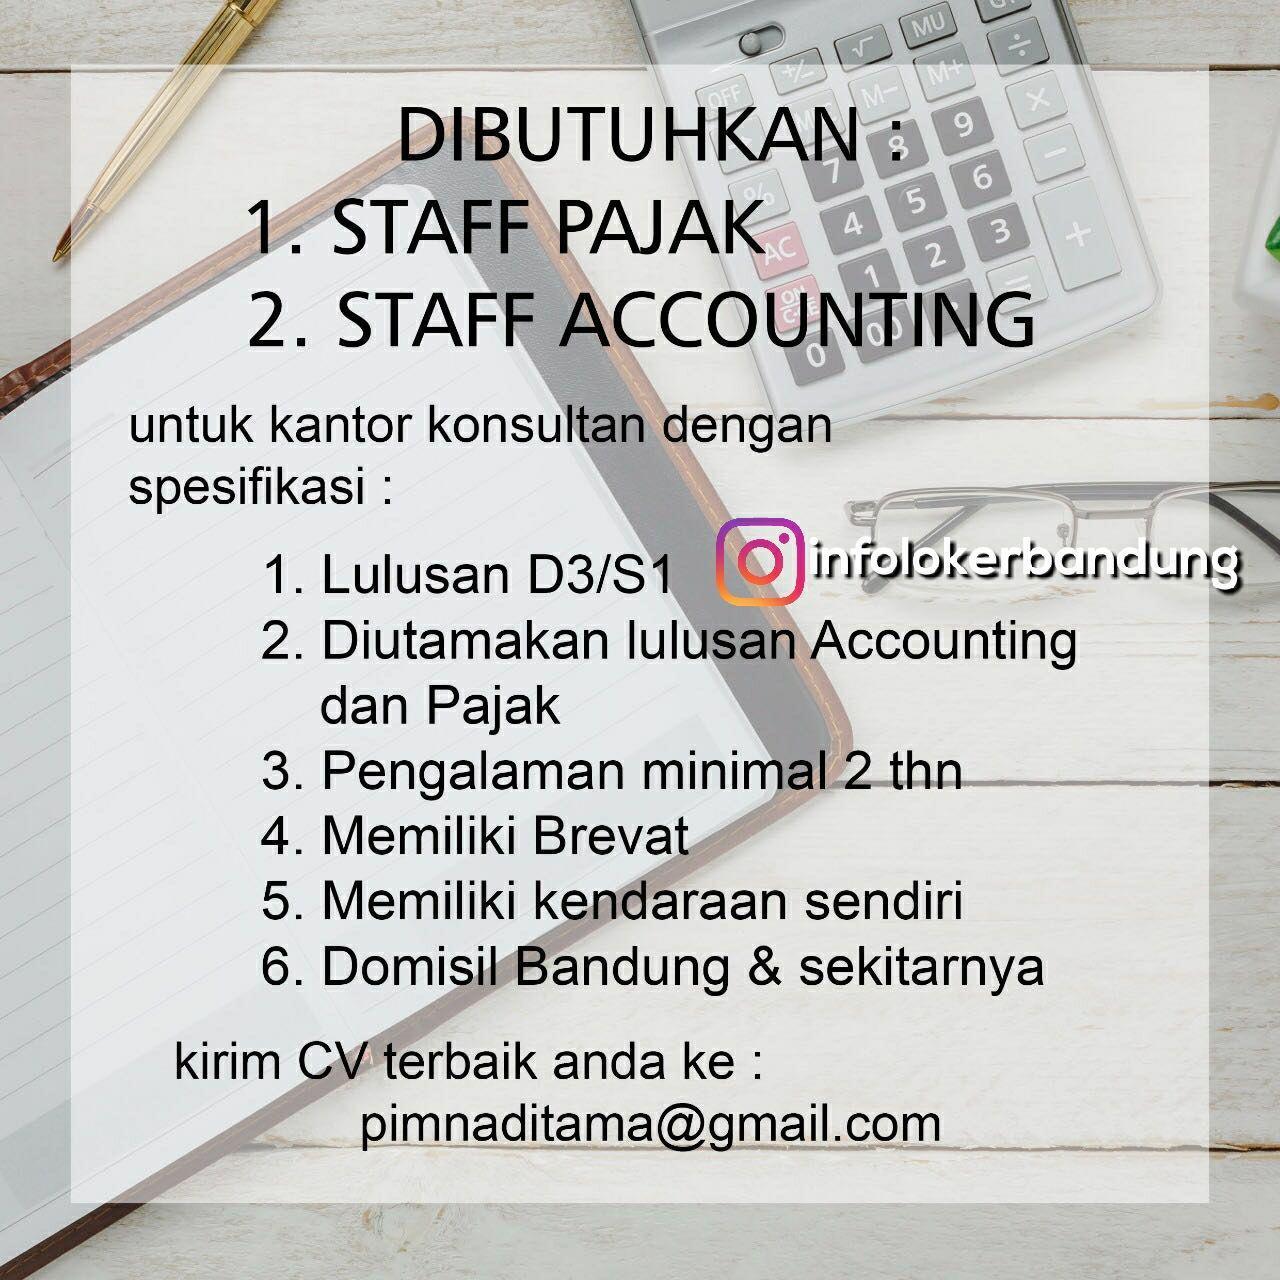 Lowongan Kerja Staff Pajak & Staff Accounting Bandung Februari 2018